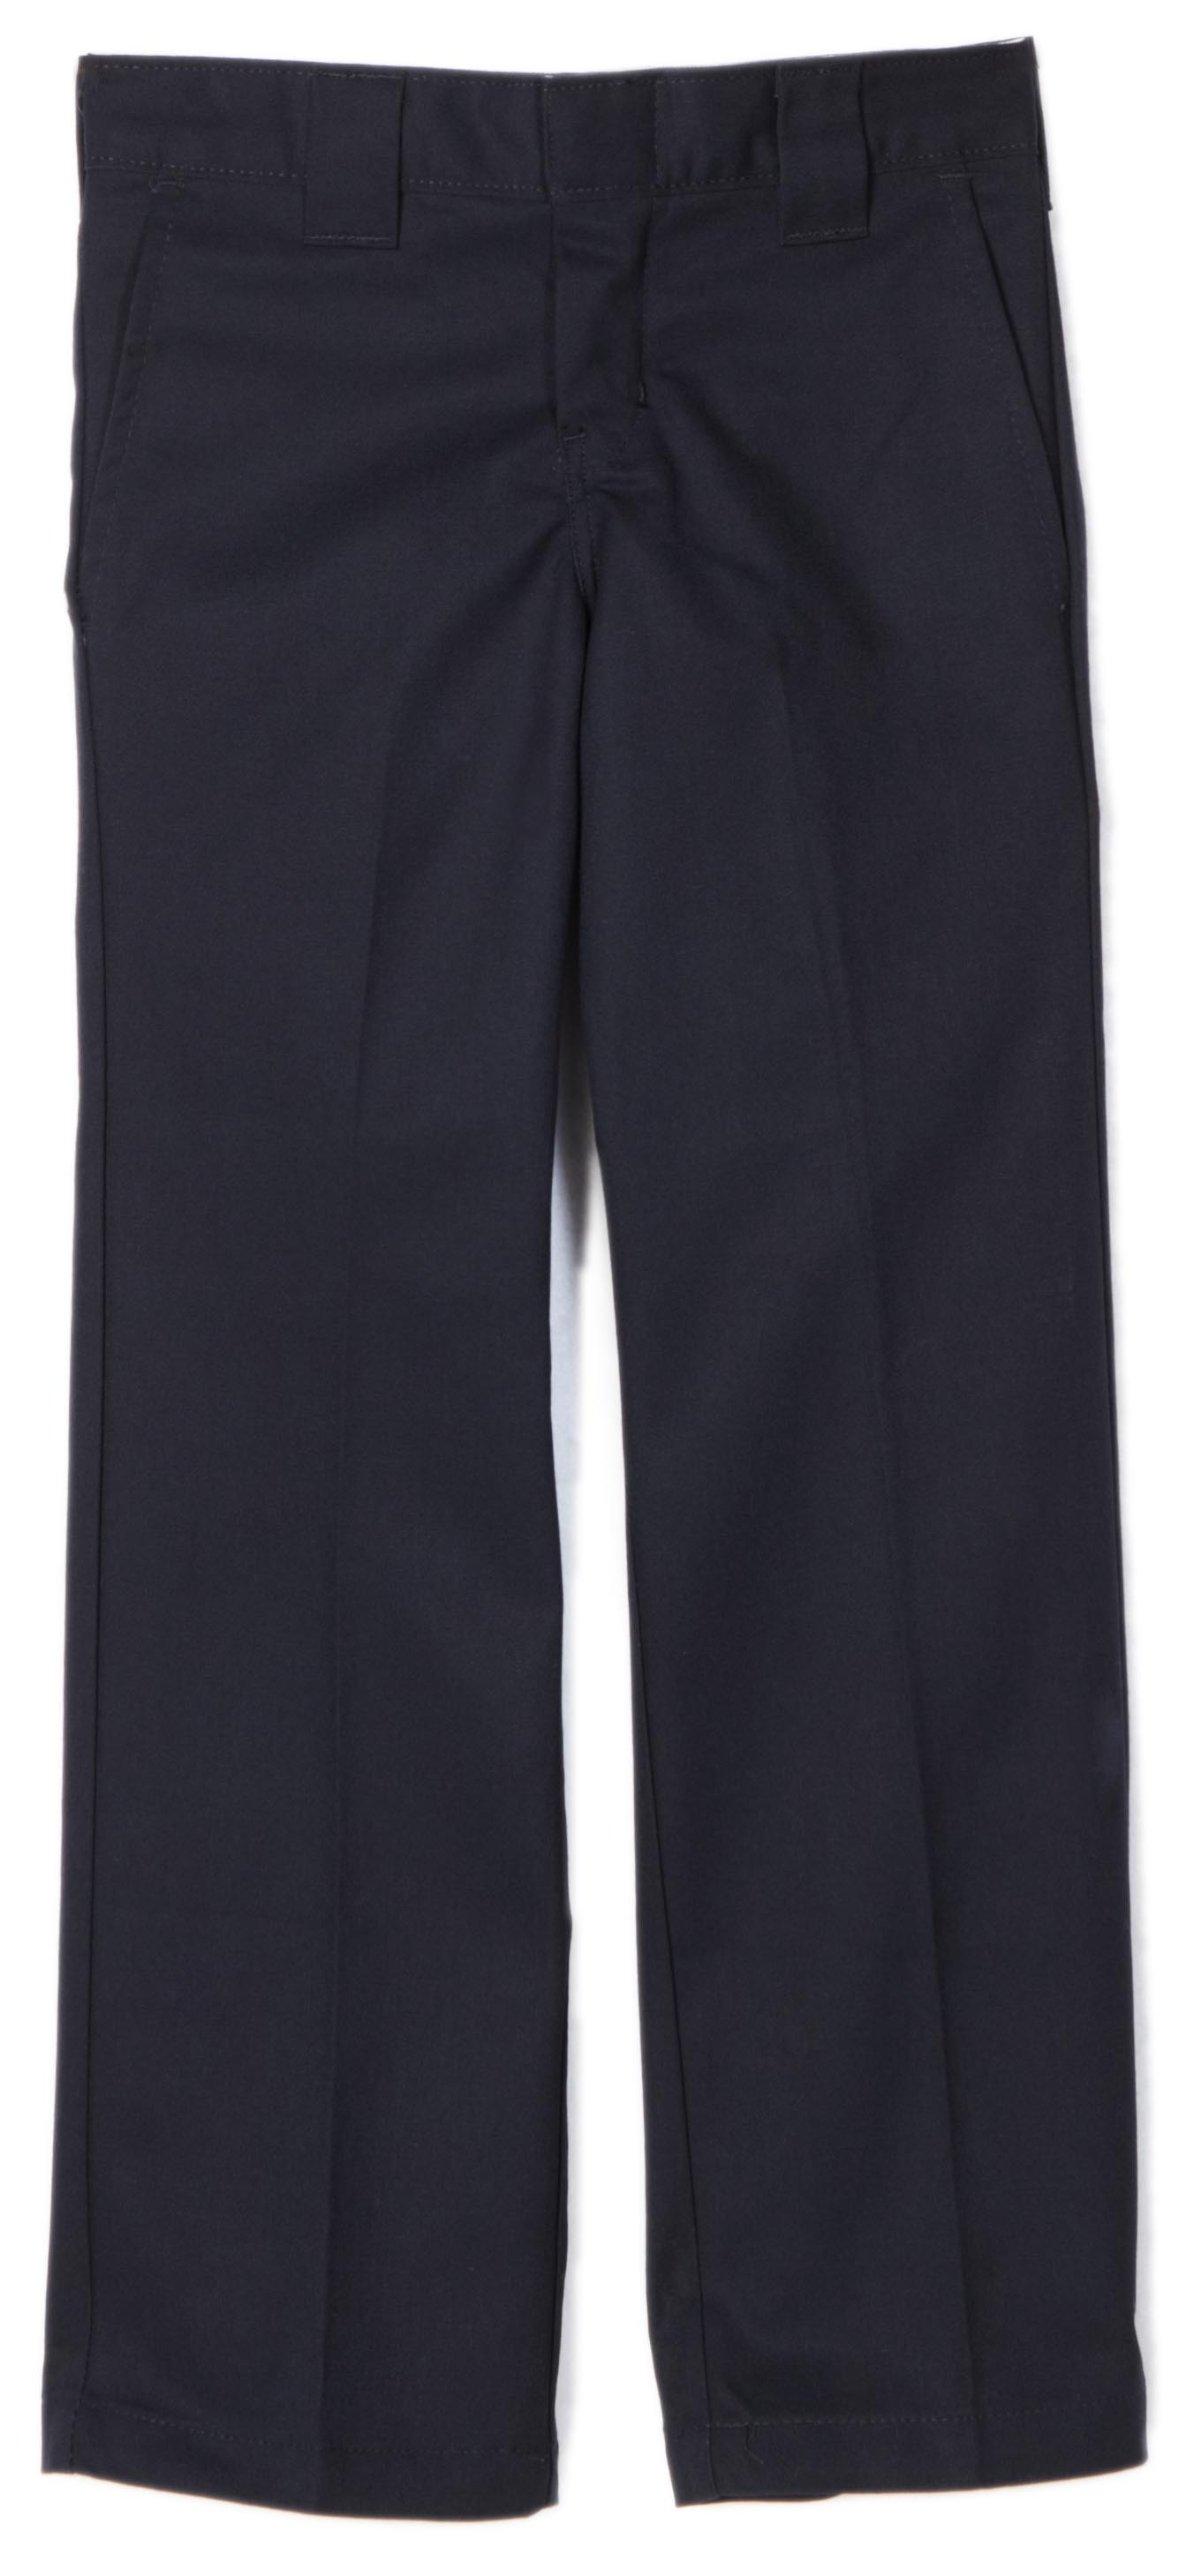 Dickies Big Boys' Slim Straight Pant, Dark Navy, 20